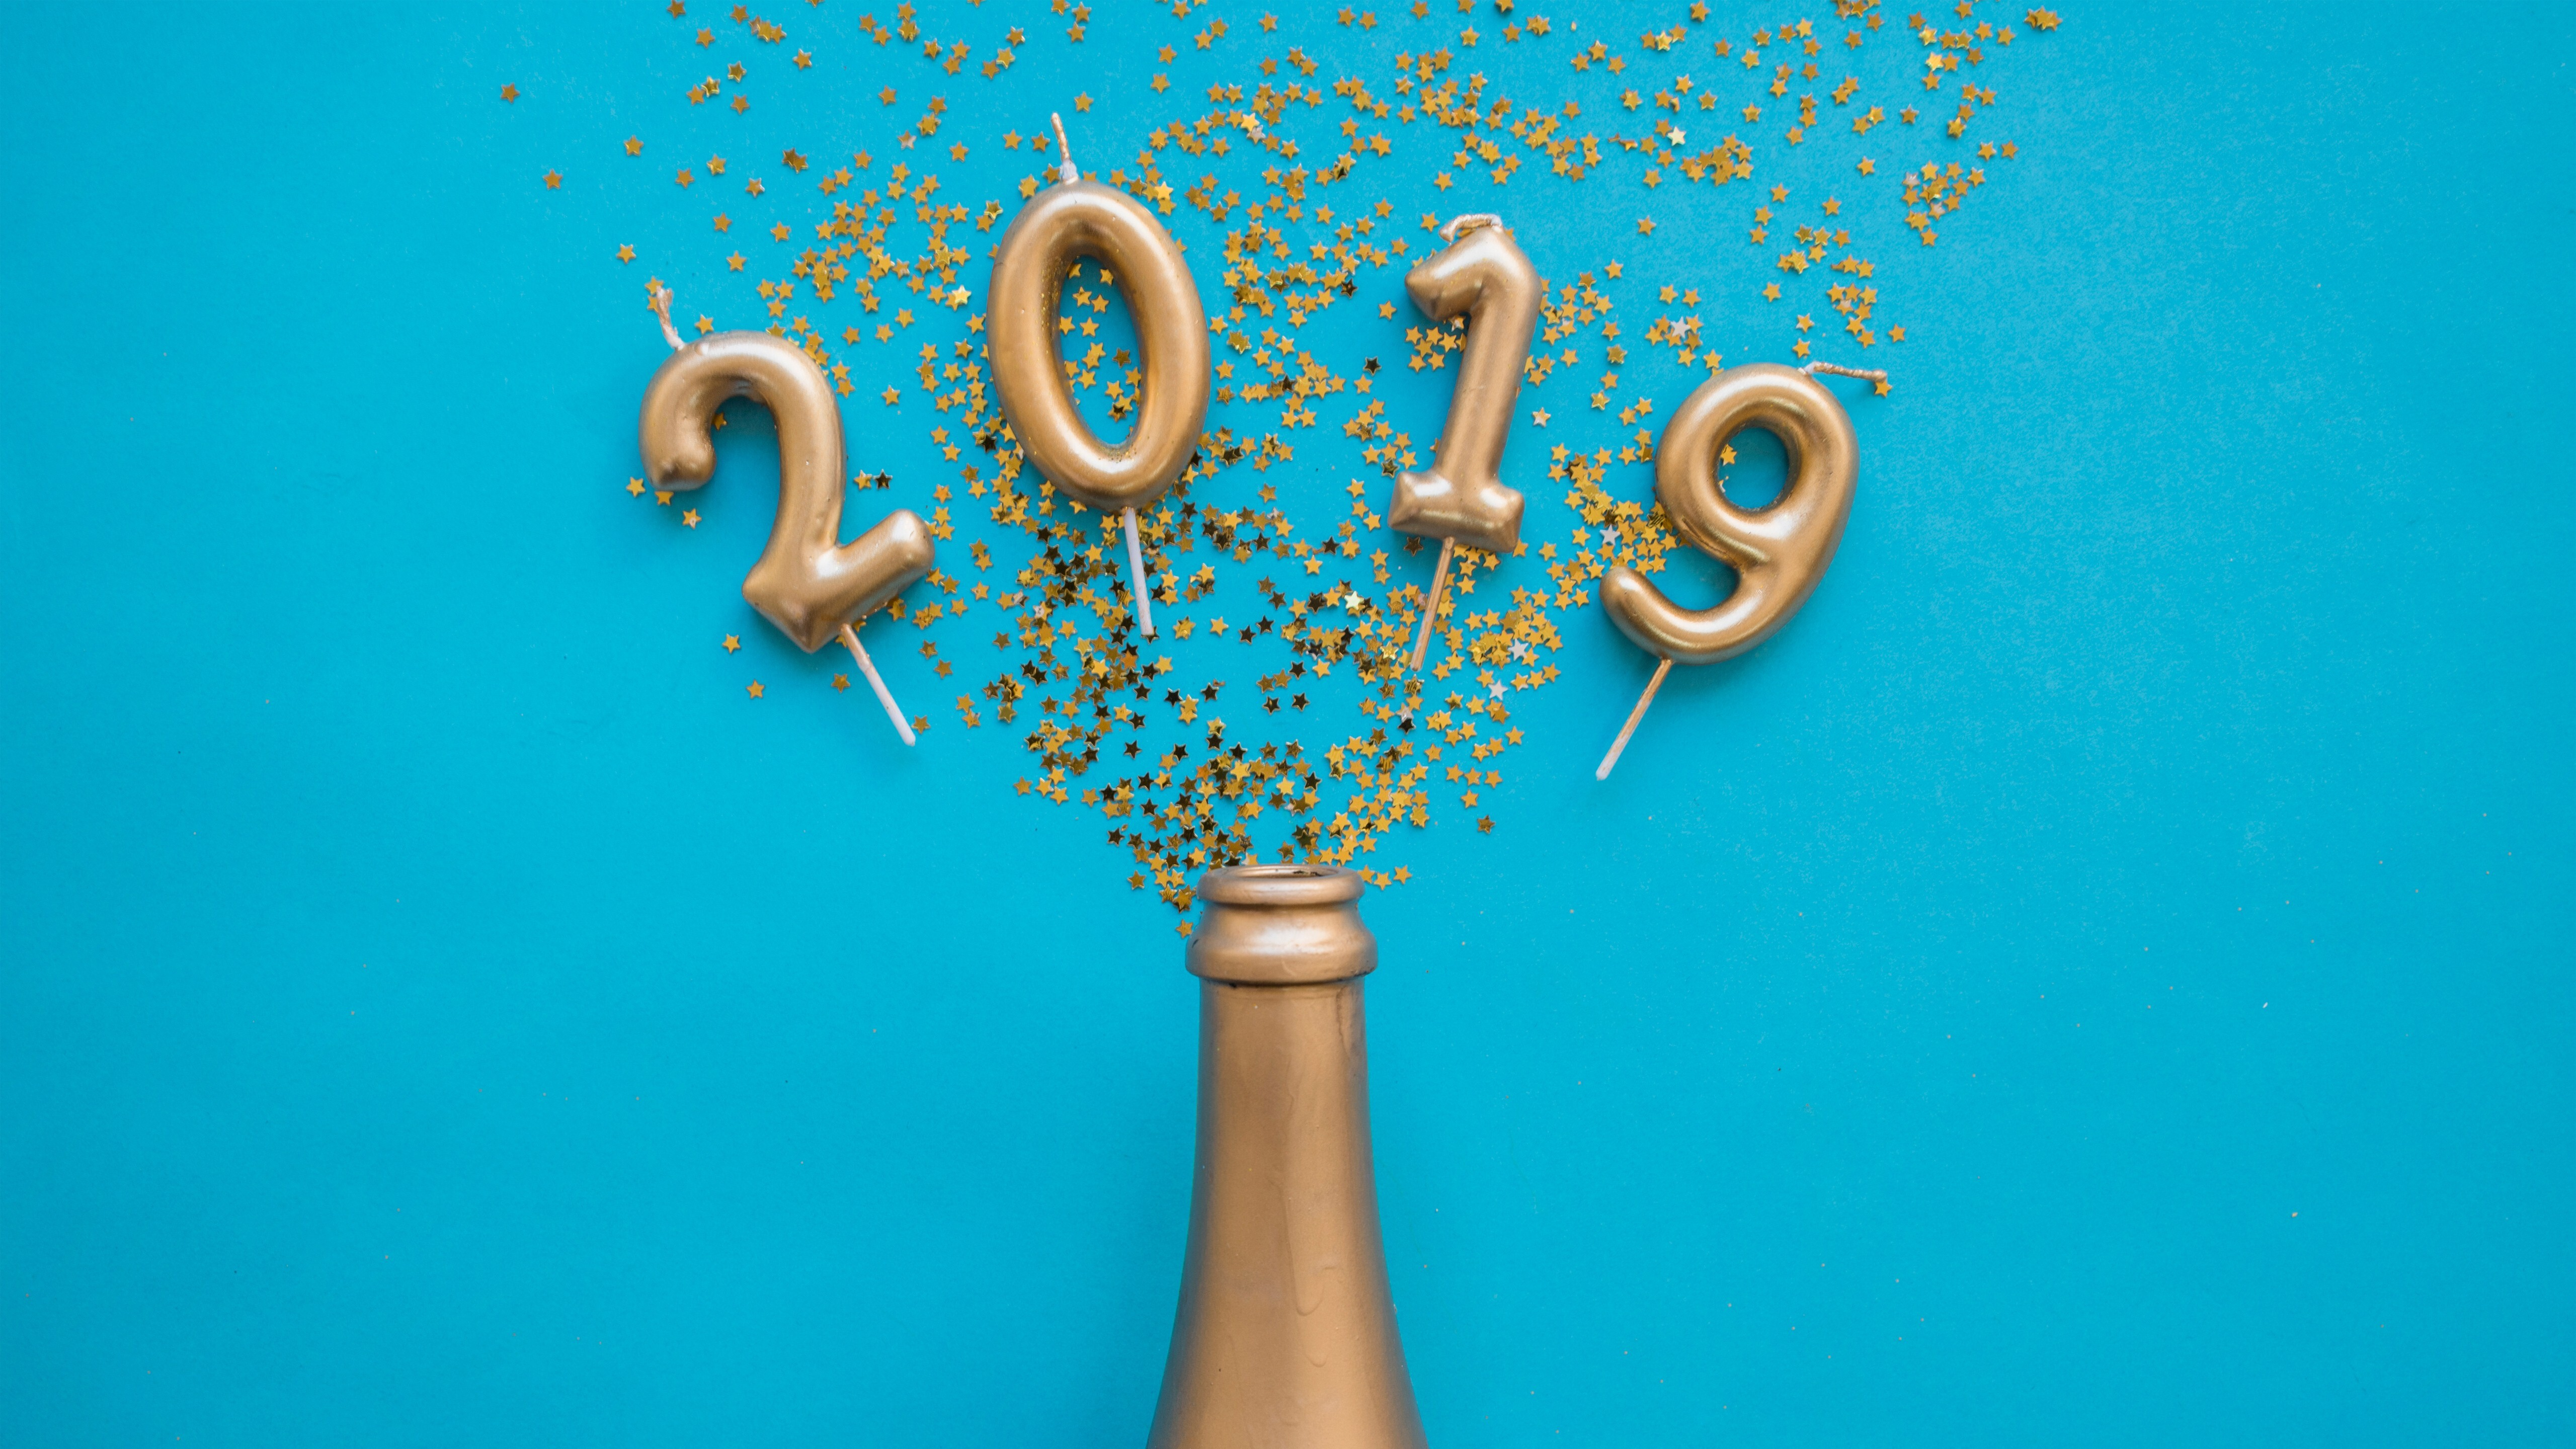 5K Wallpaper of 2019 New Year Wallpaper | HD Wallpapers